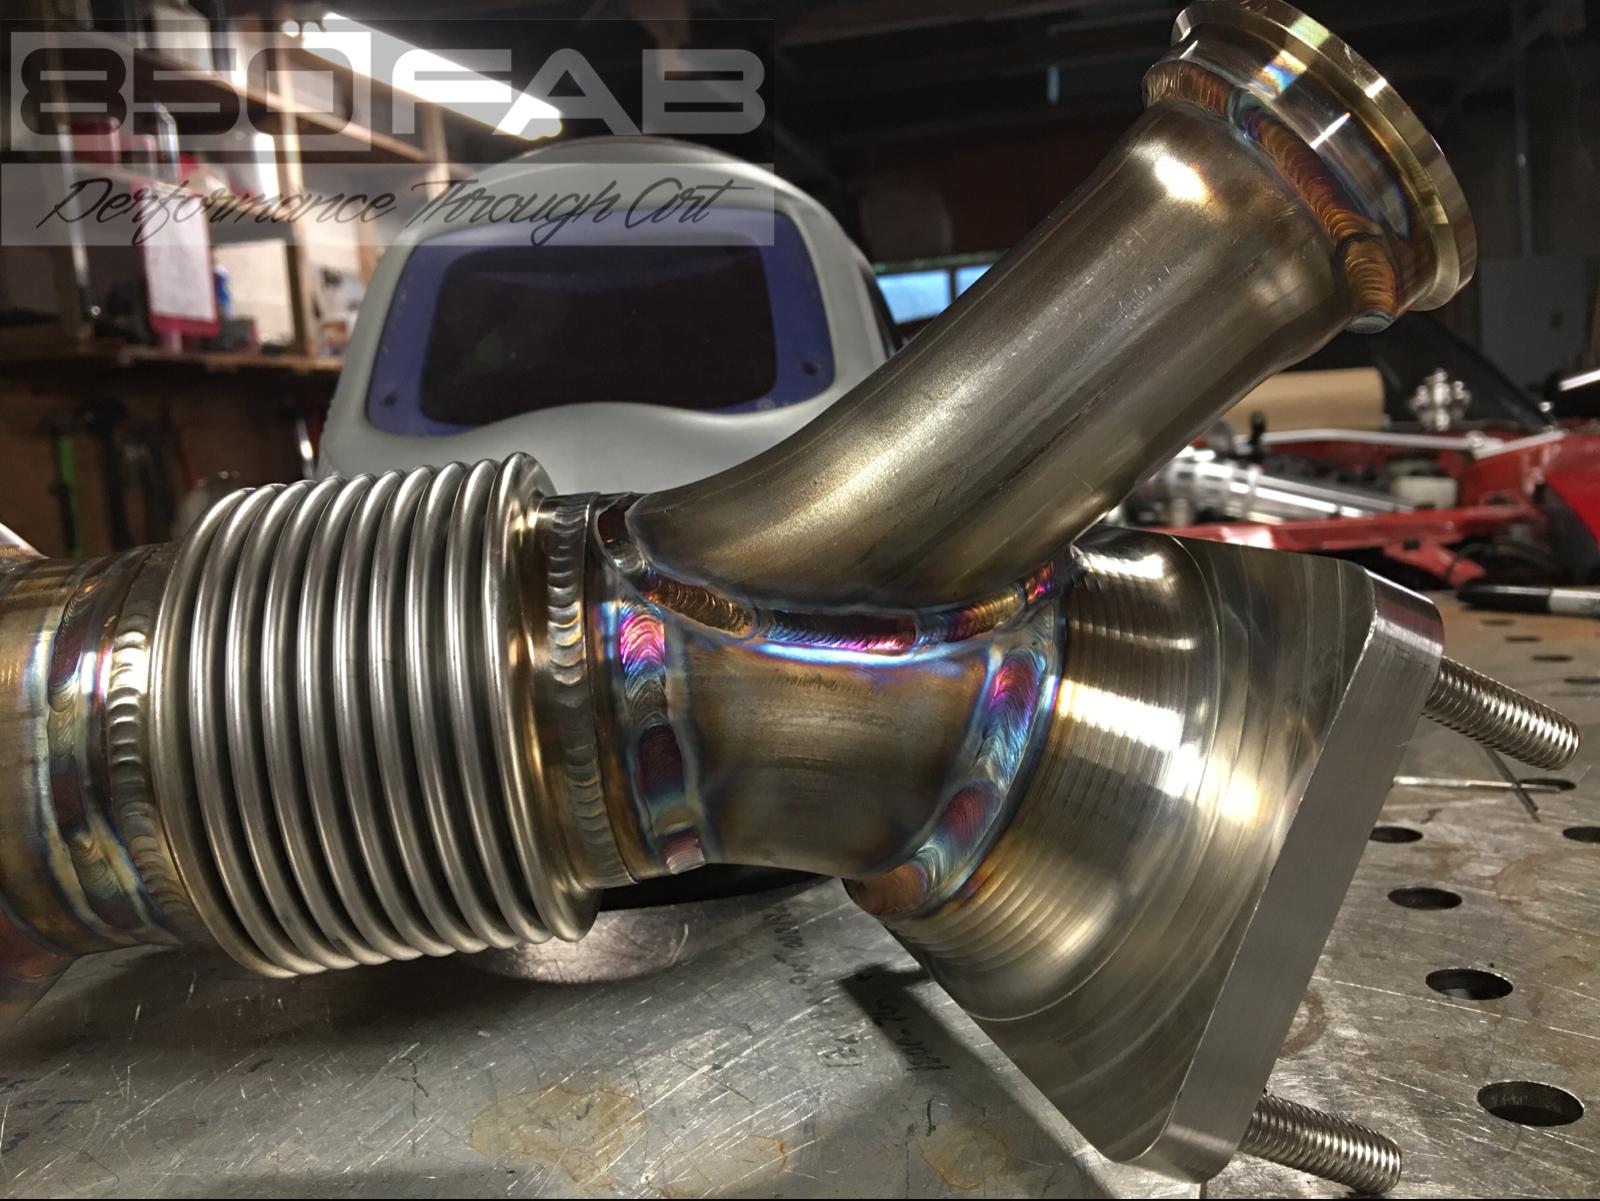 Honda Jacksonville Fl >> Post your best welds!!!!!!! - Page 122 - Honda-Tech - Honda Forum Discussion